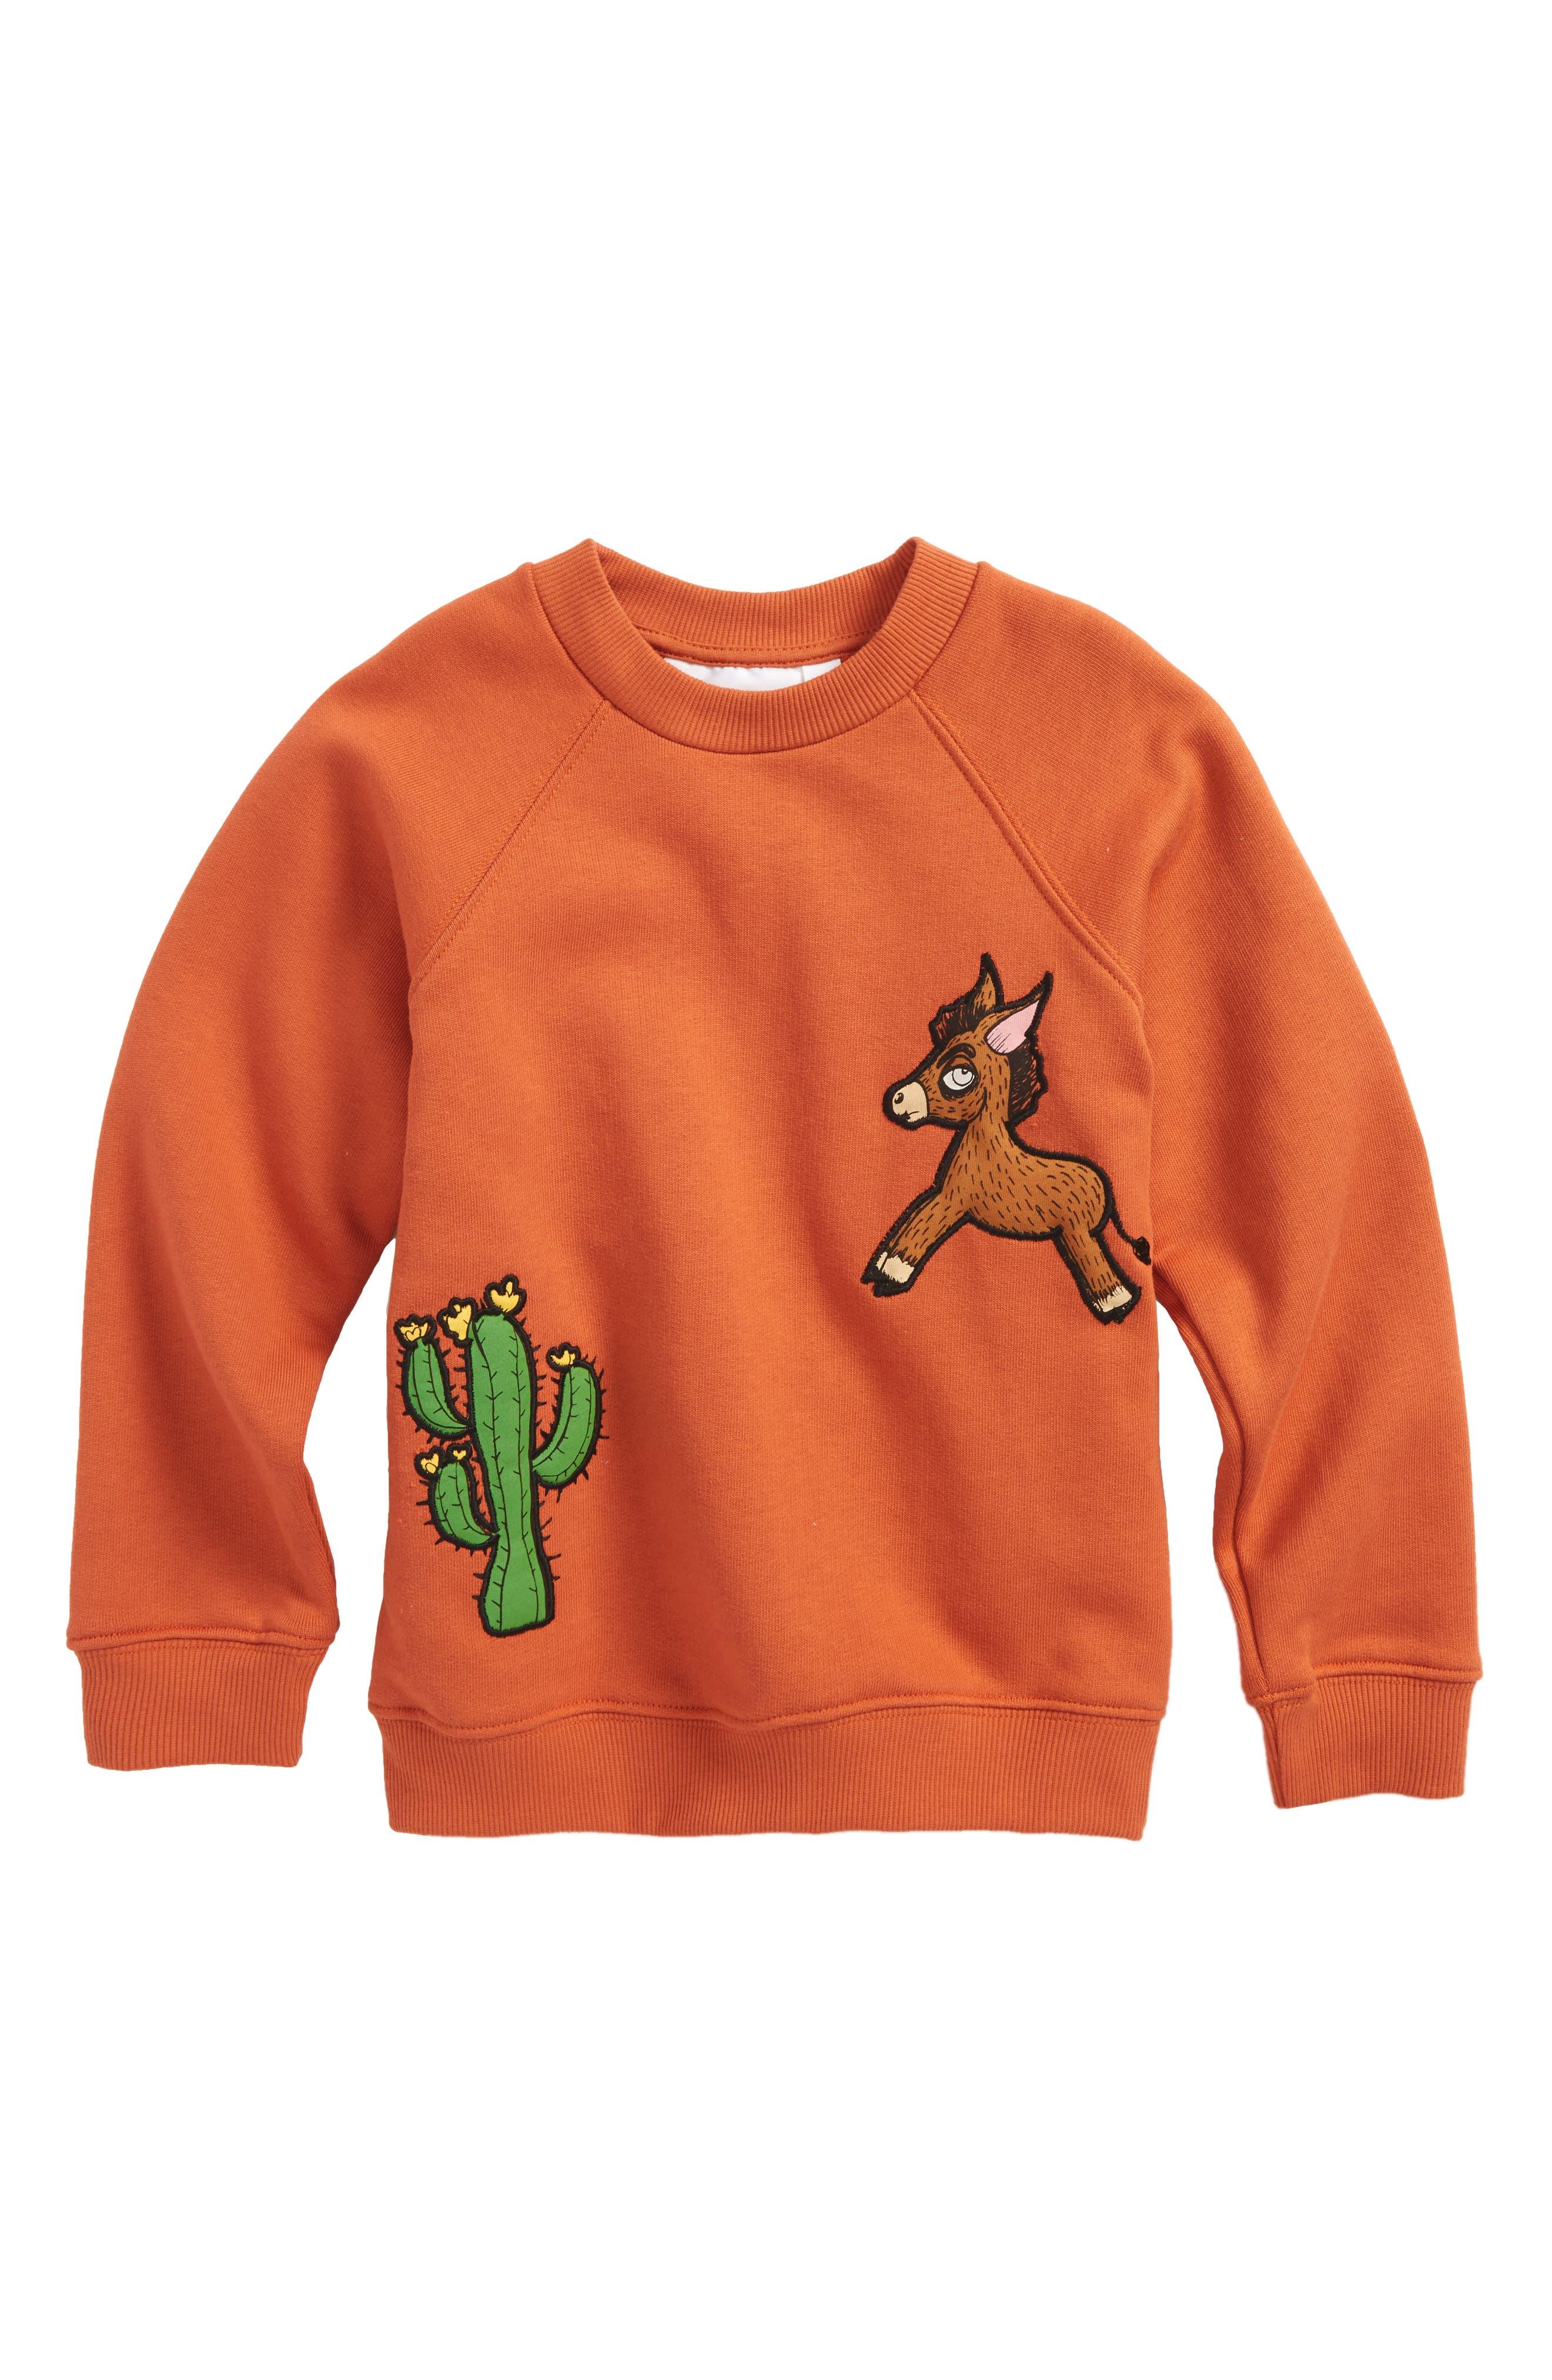 Main Image - Mini Rodini Donkey & Cactus Appliqué Organic Cotton Sweatshirt (Toddler Boys & Little Boys)